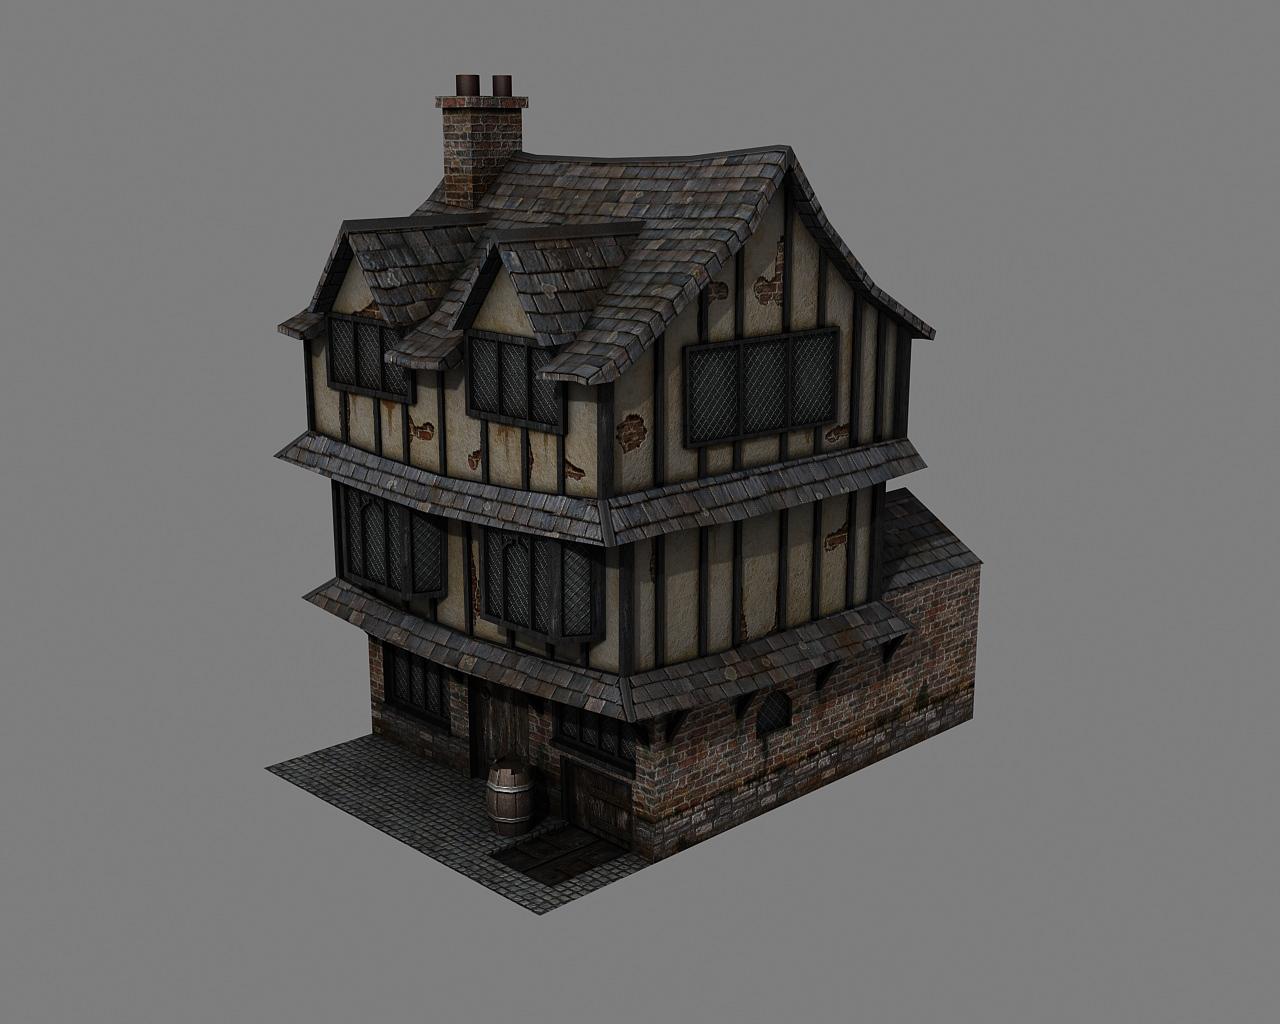 Exceptional Tudor House 3d Model Low Poly Max Obj 3ds Tga 1 ...